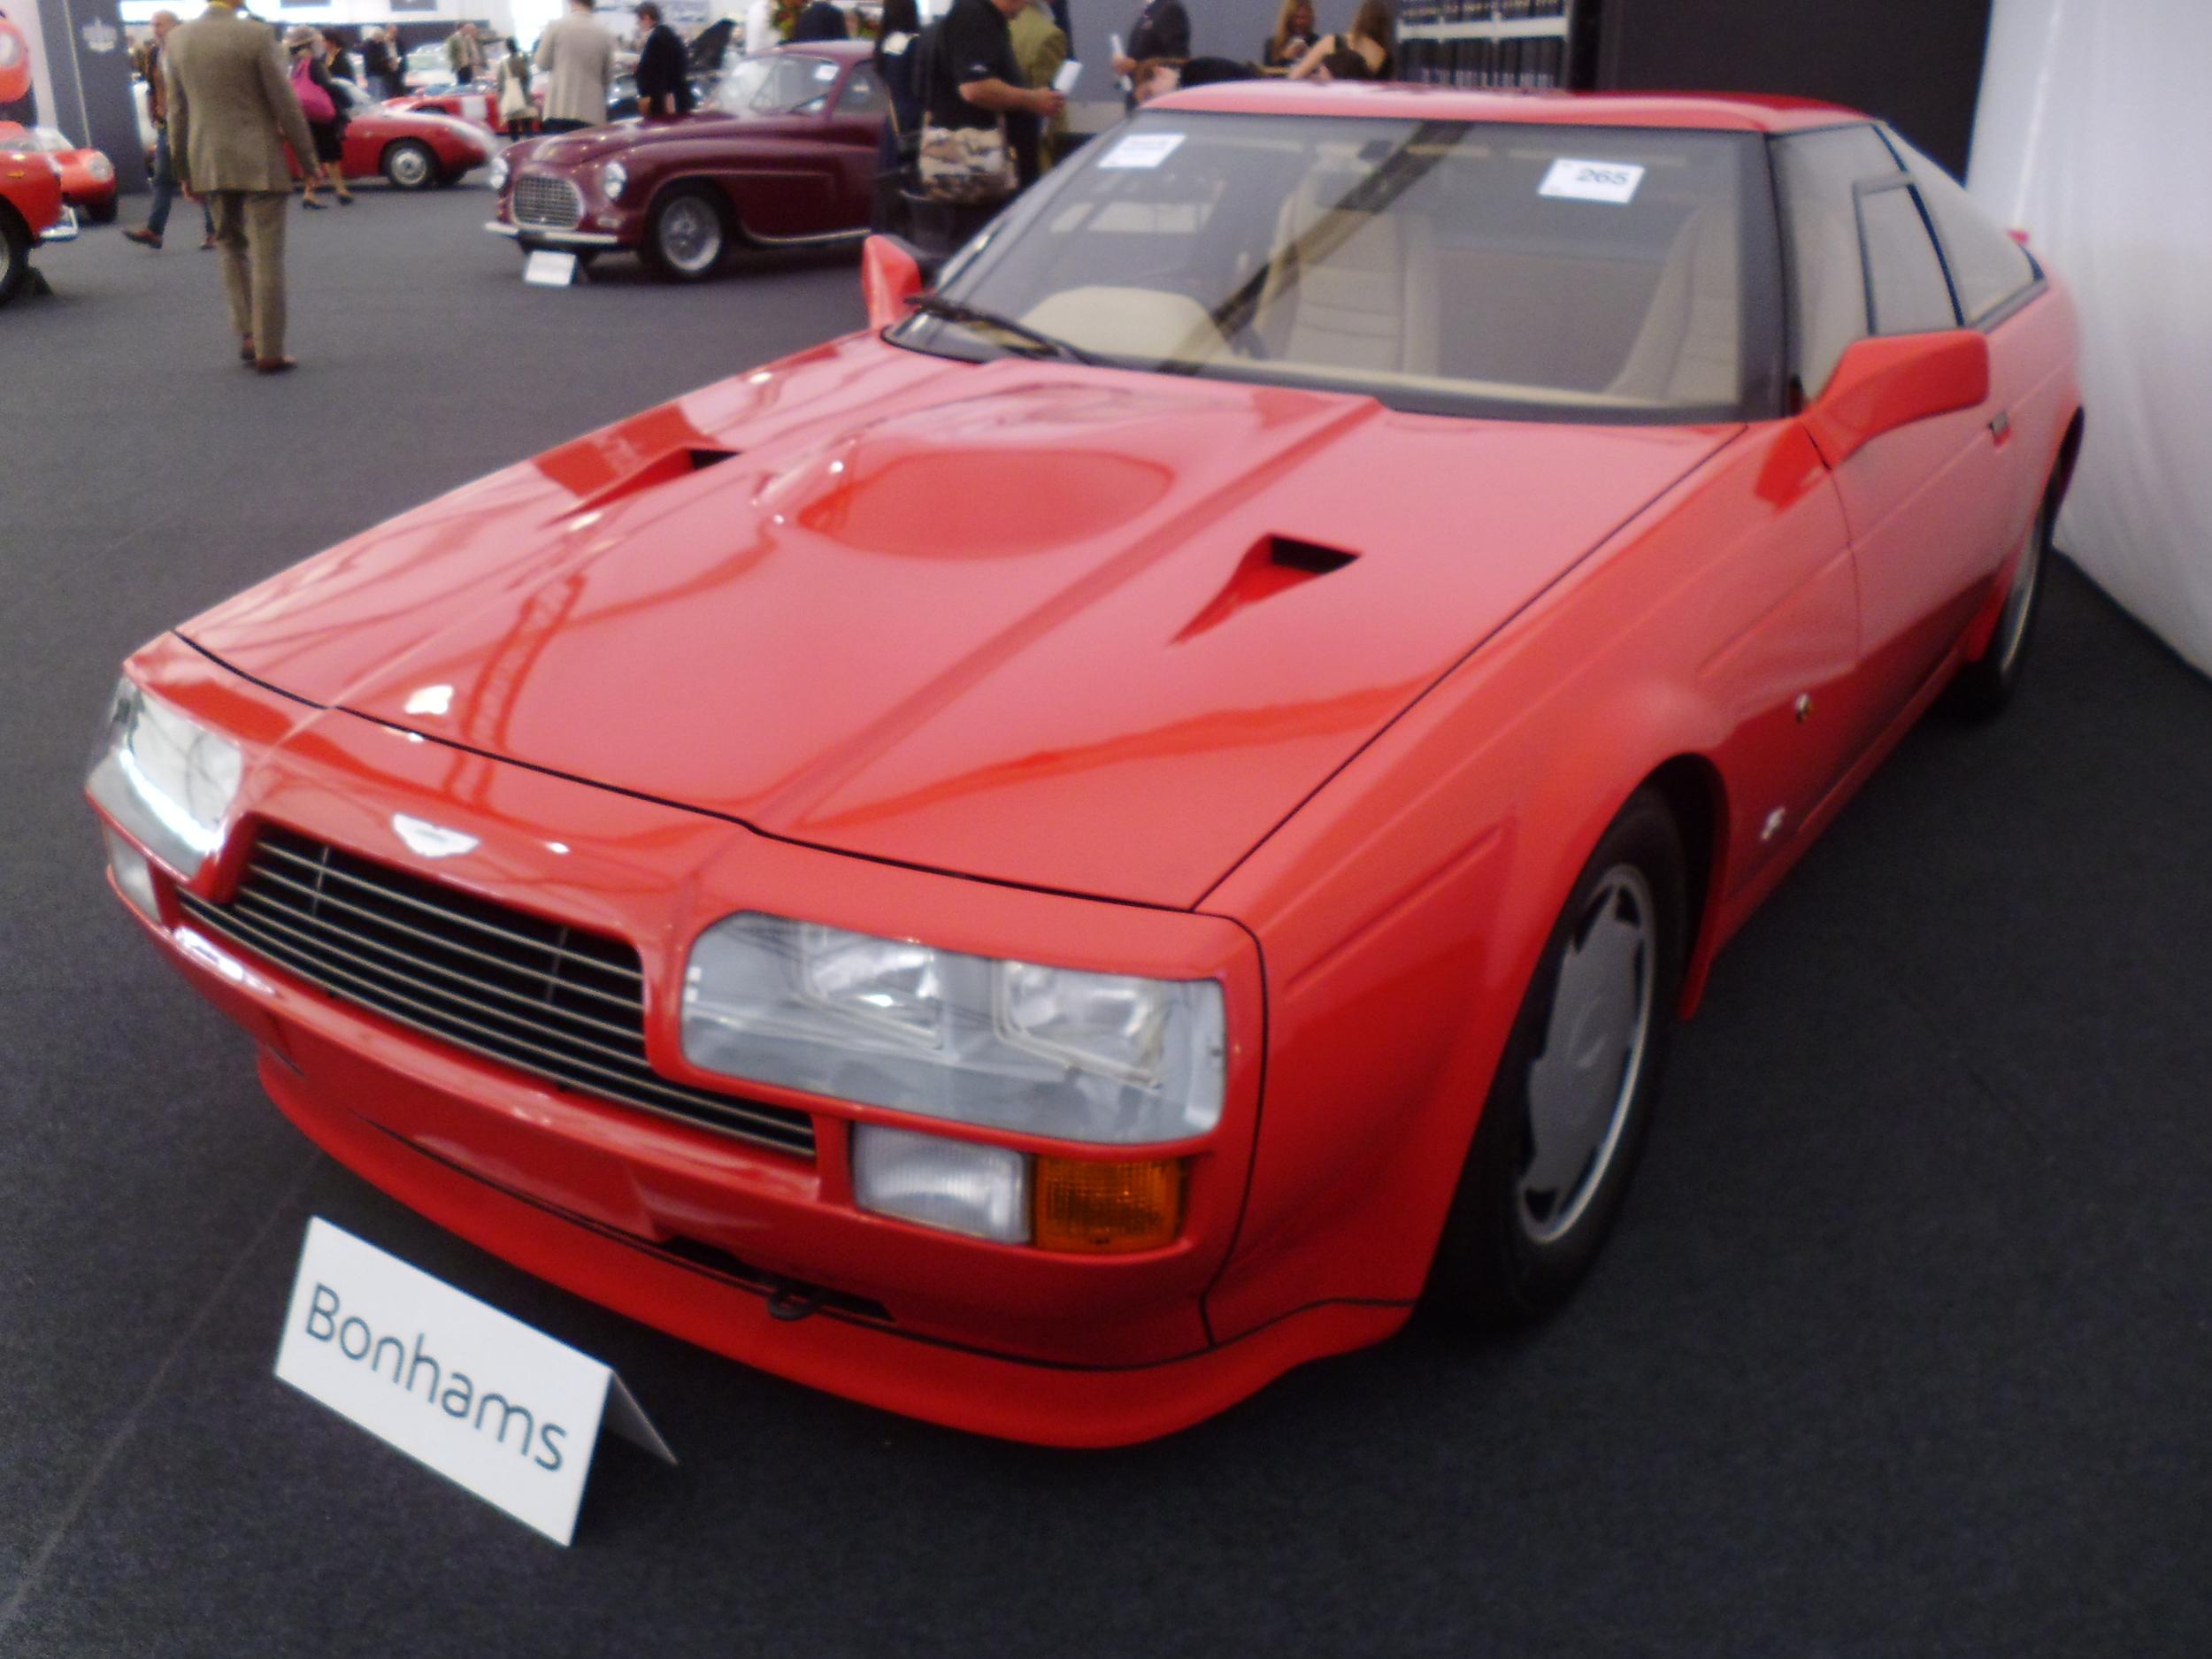 P1040567.JPG